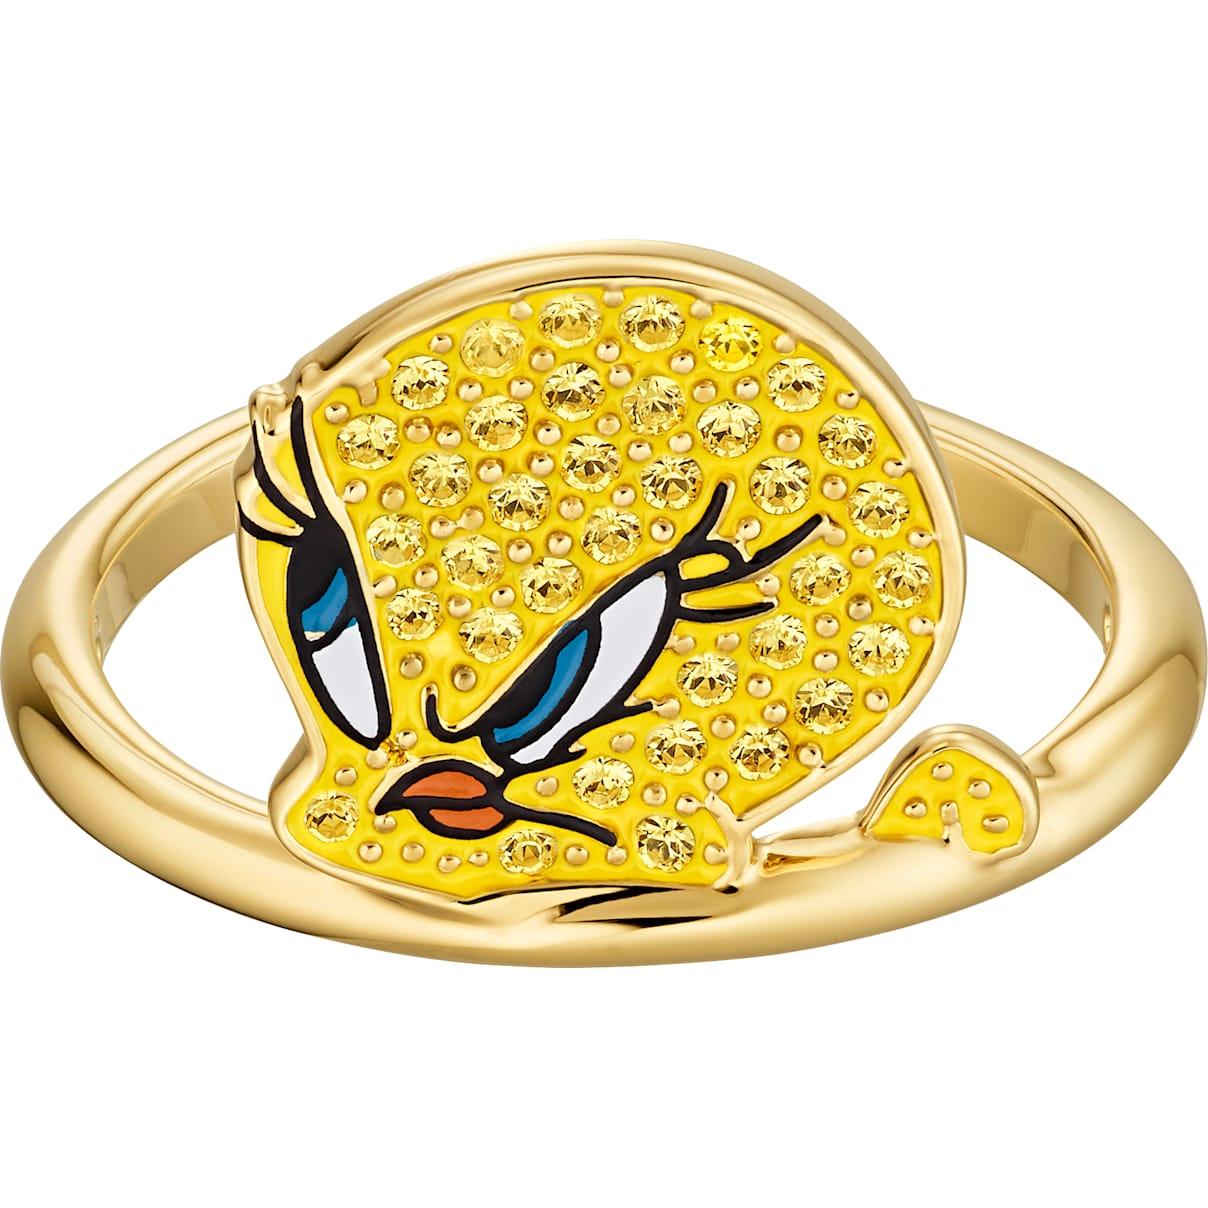 Swarovski Looney Tunes Tweety Motif Ring, Yellow, Gold-tone plated